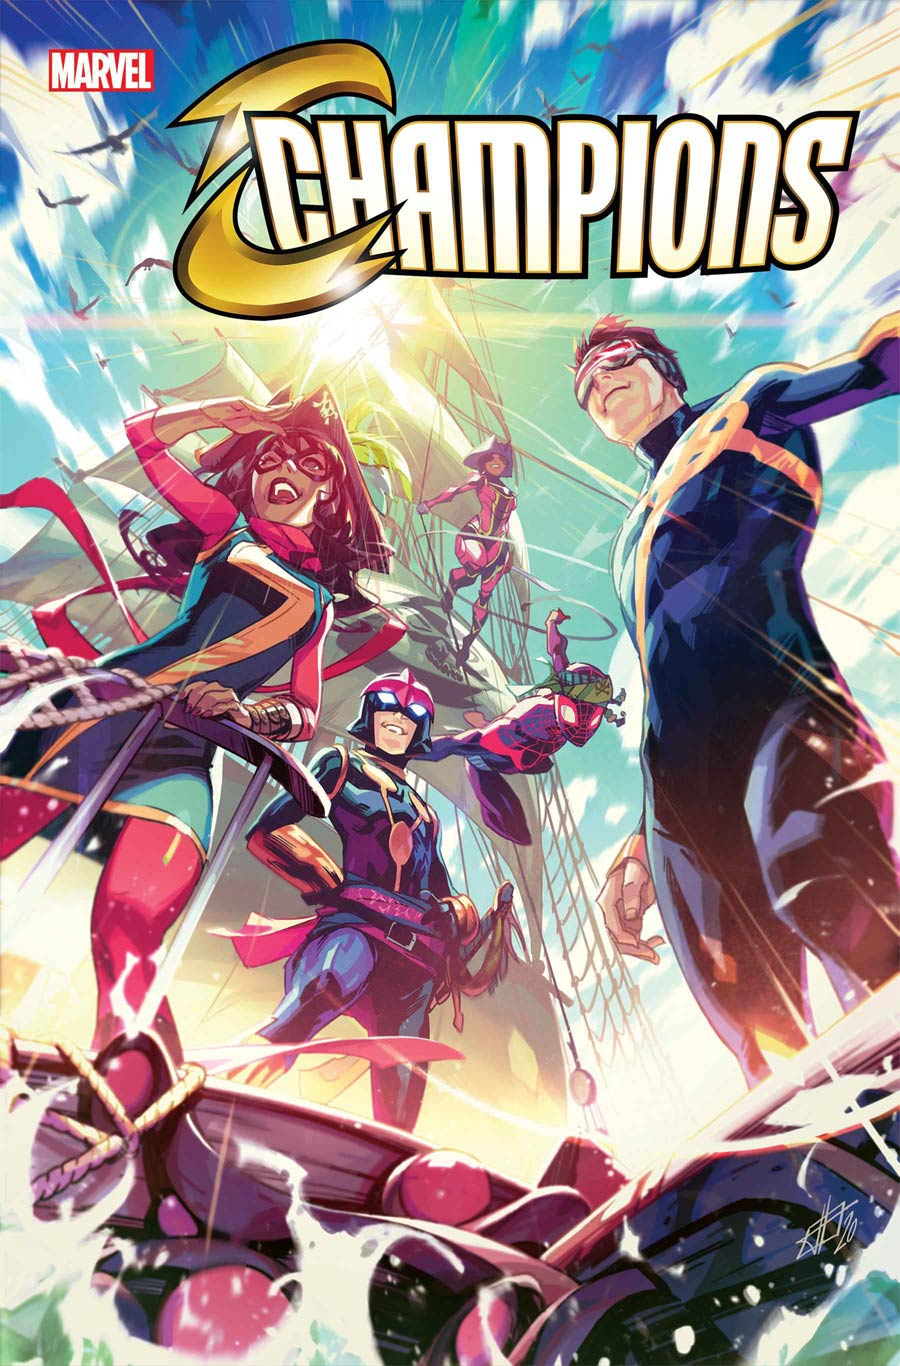 Champions (Marvel) Vol 4 #4 Cover A Regular Toni Infante Cover